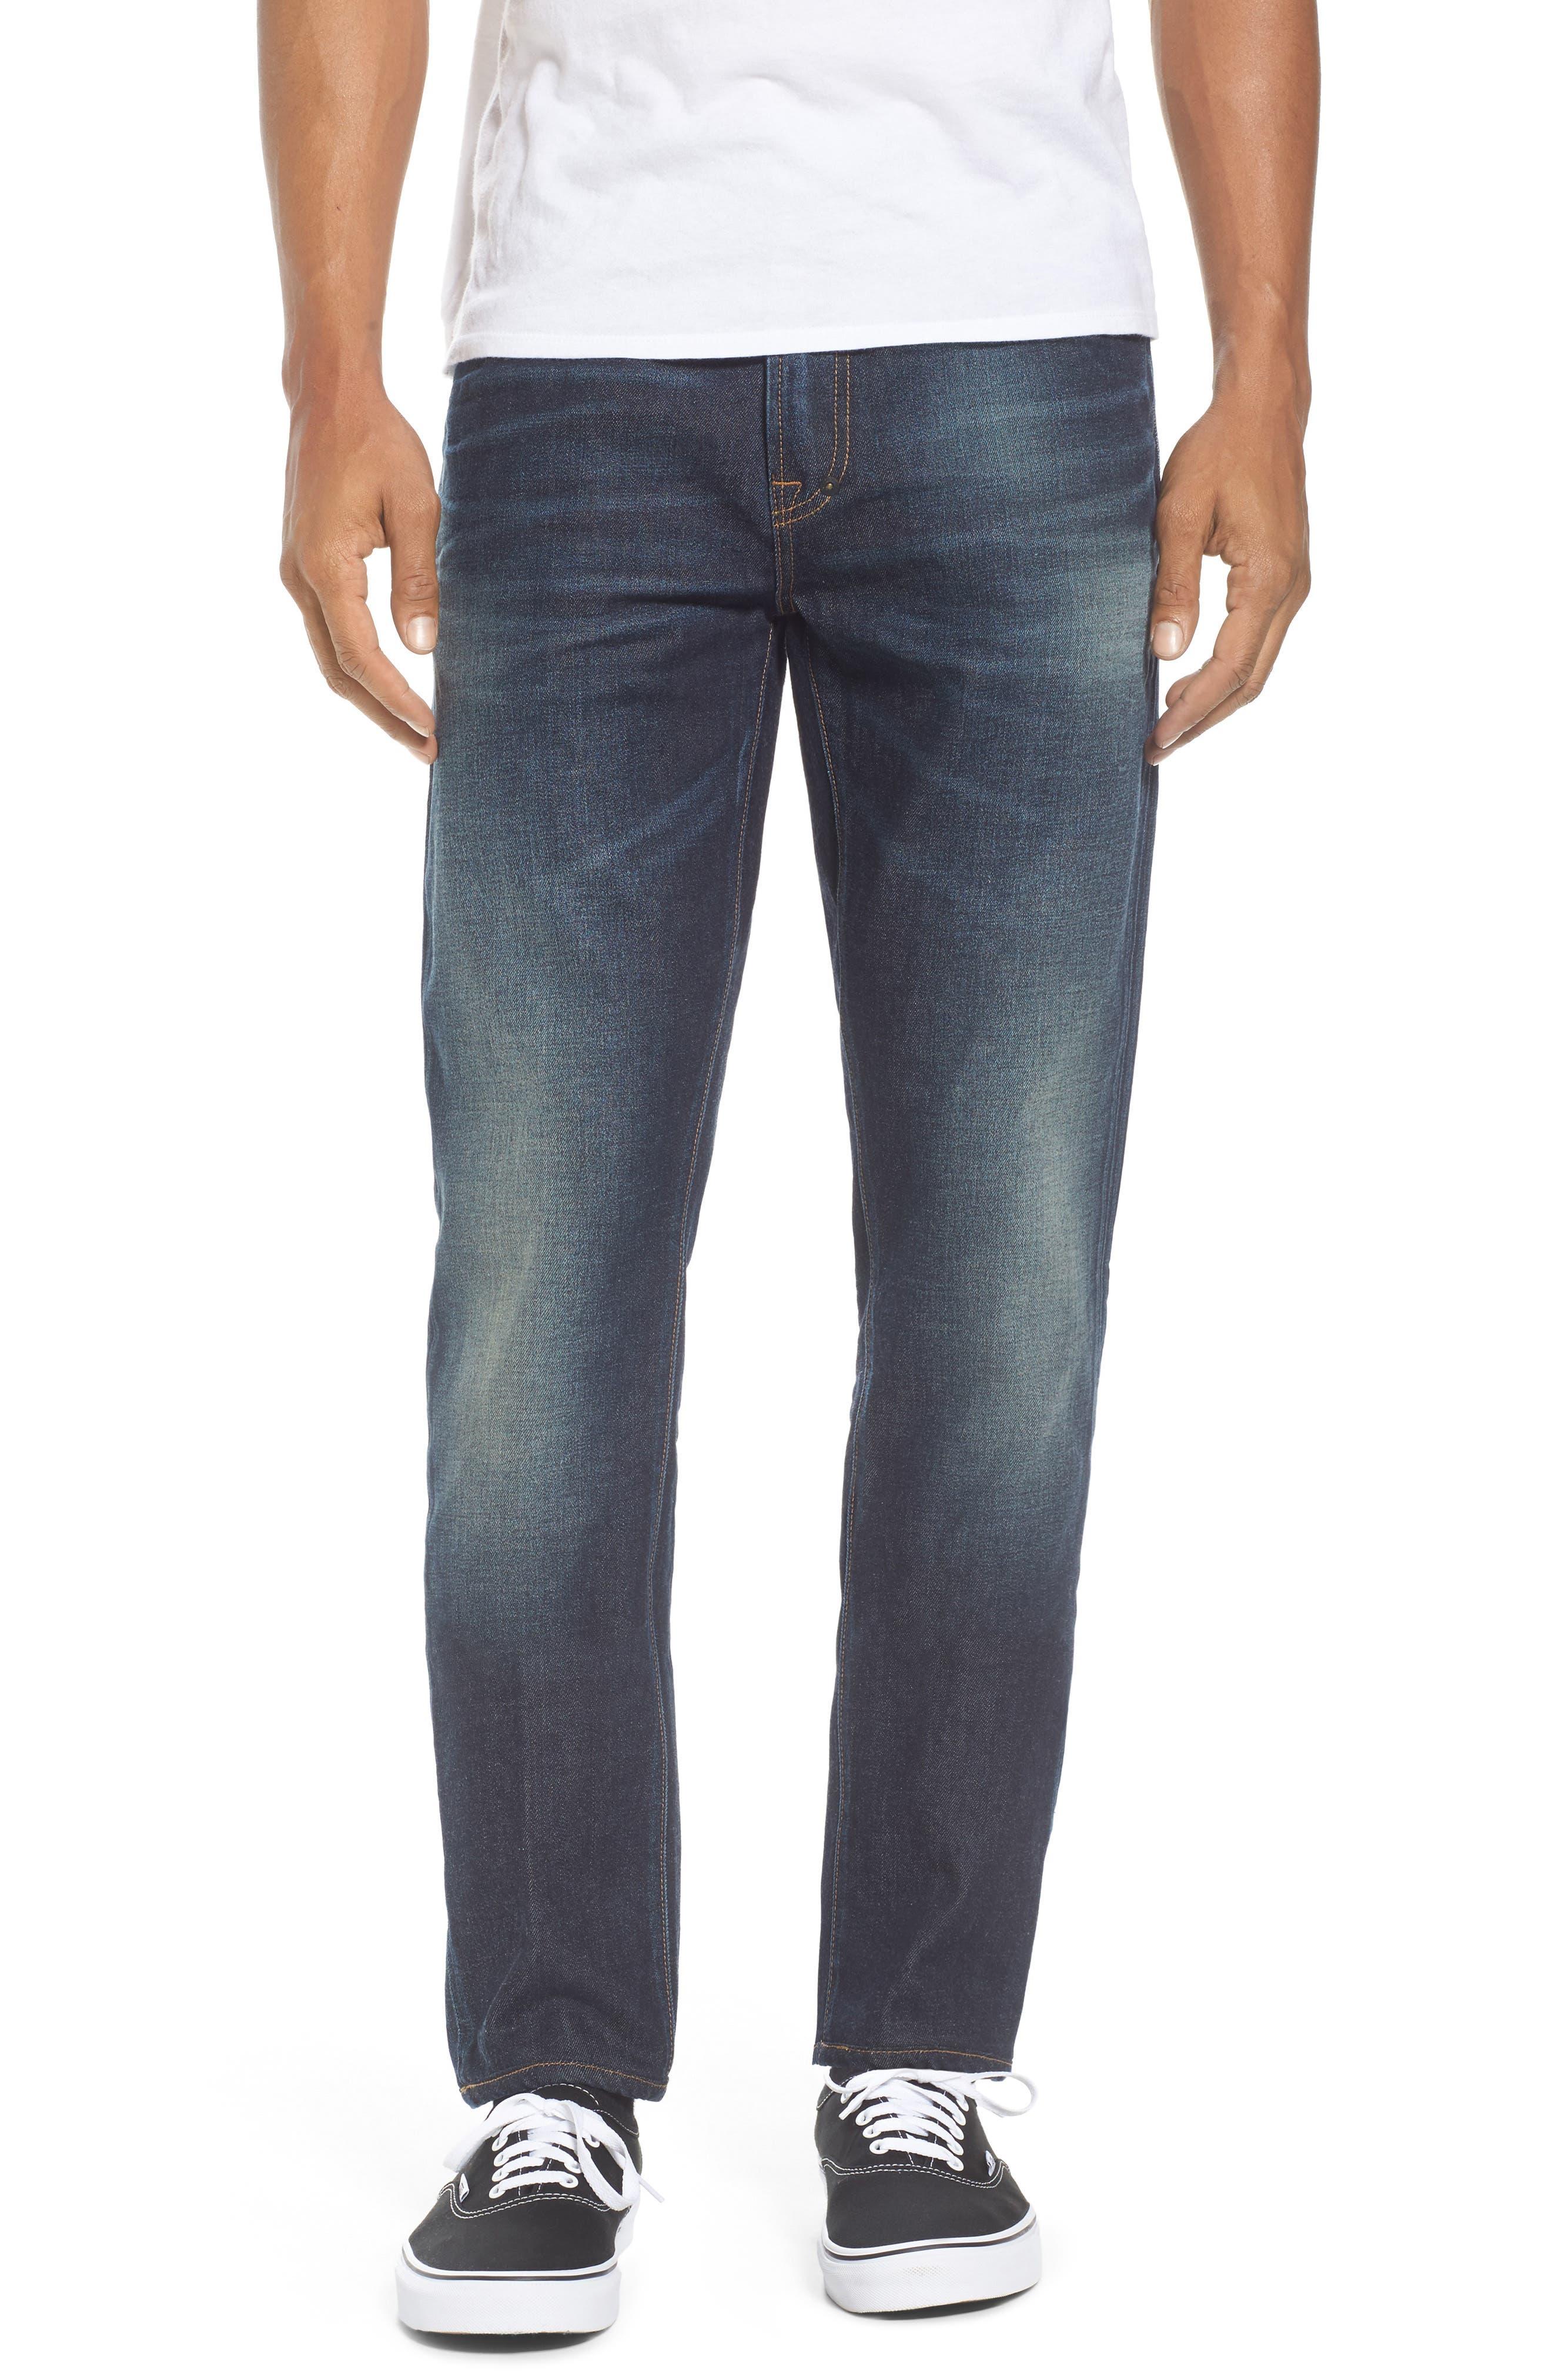 Windsor Slim Fit Jeans,                             Main thumbnail 1, color,                             Medium